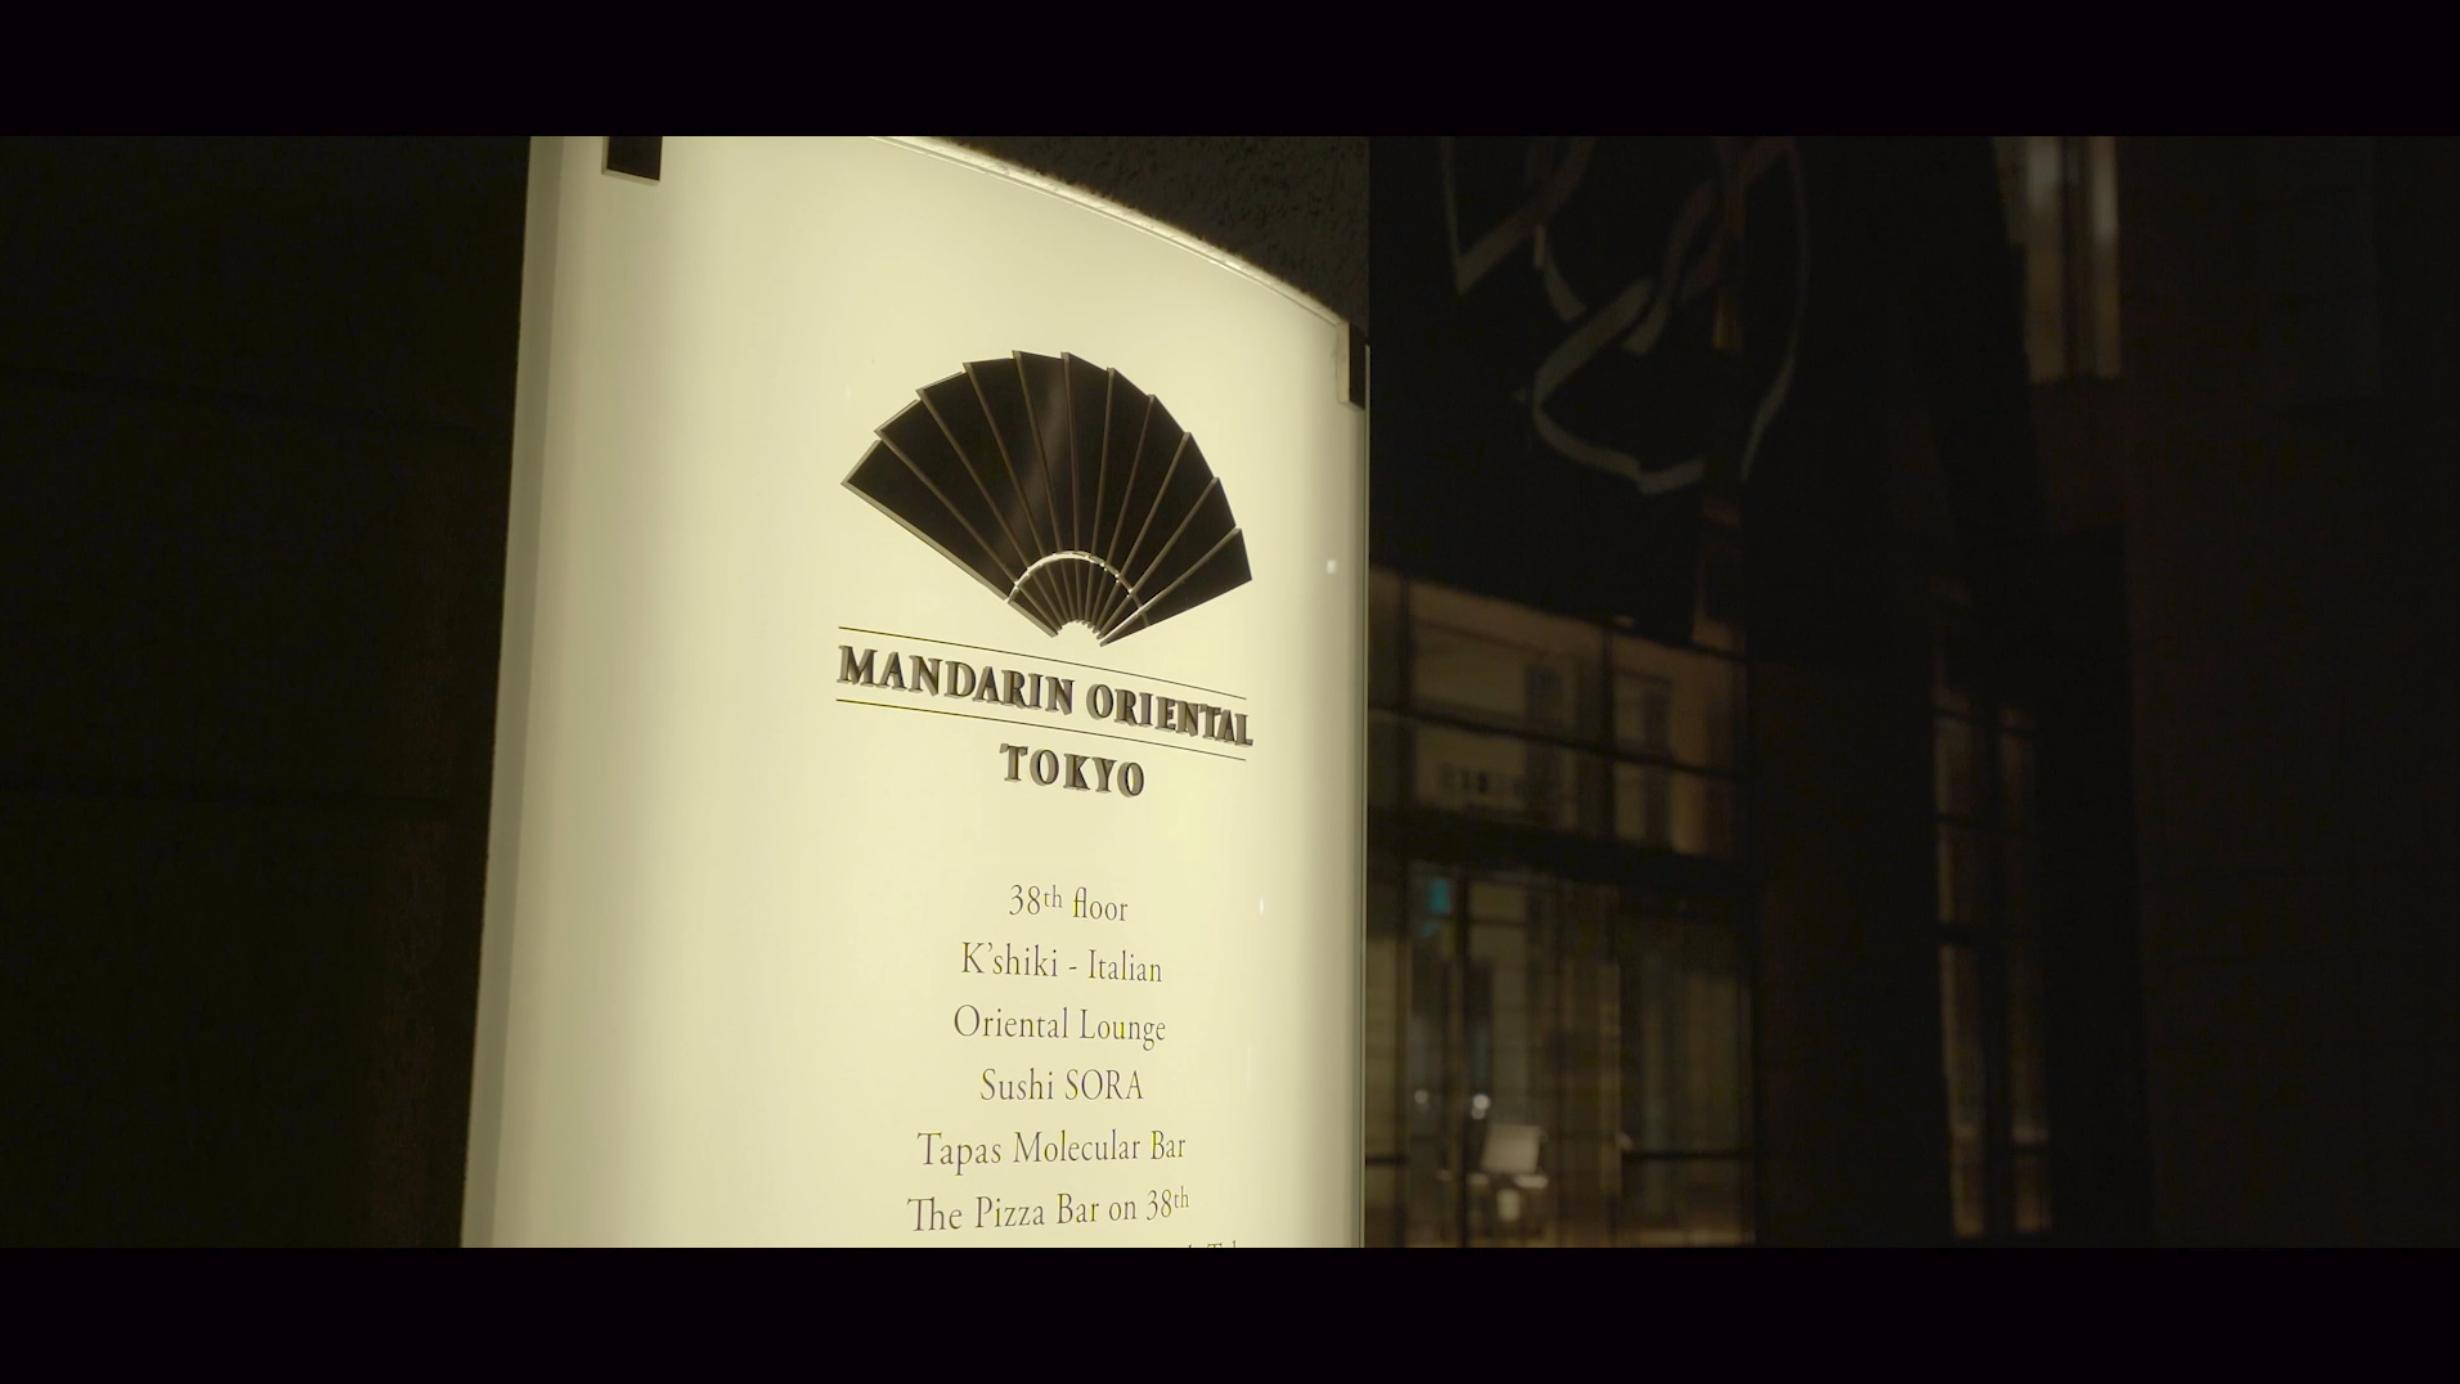 The Moment, Mandarin Oriental, Tokyo